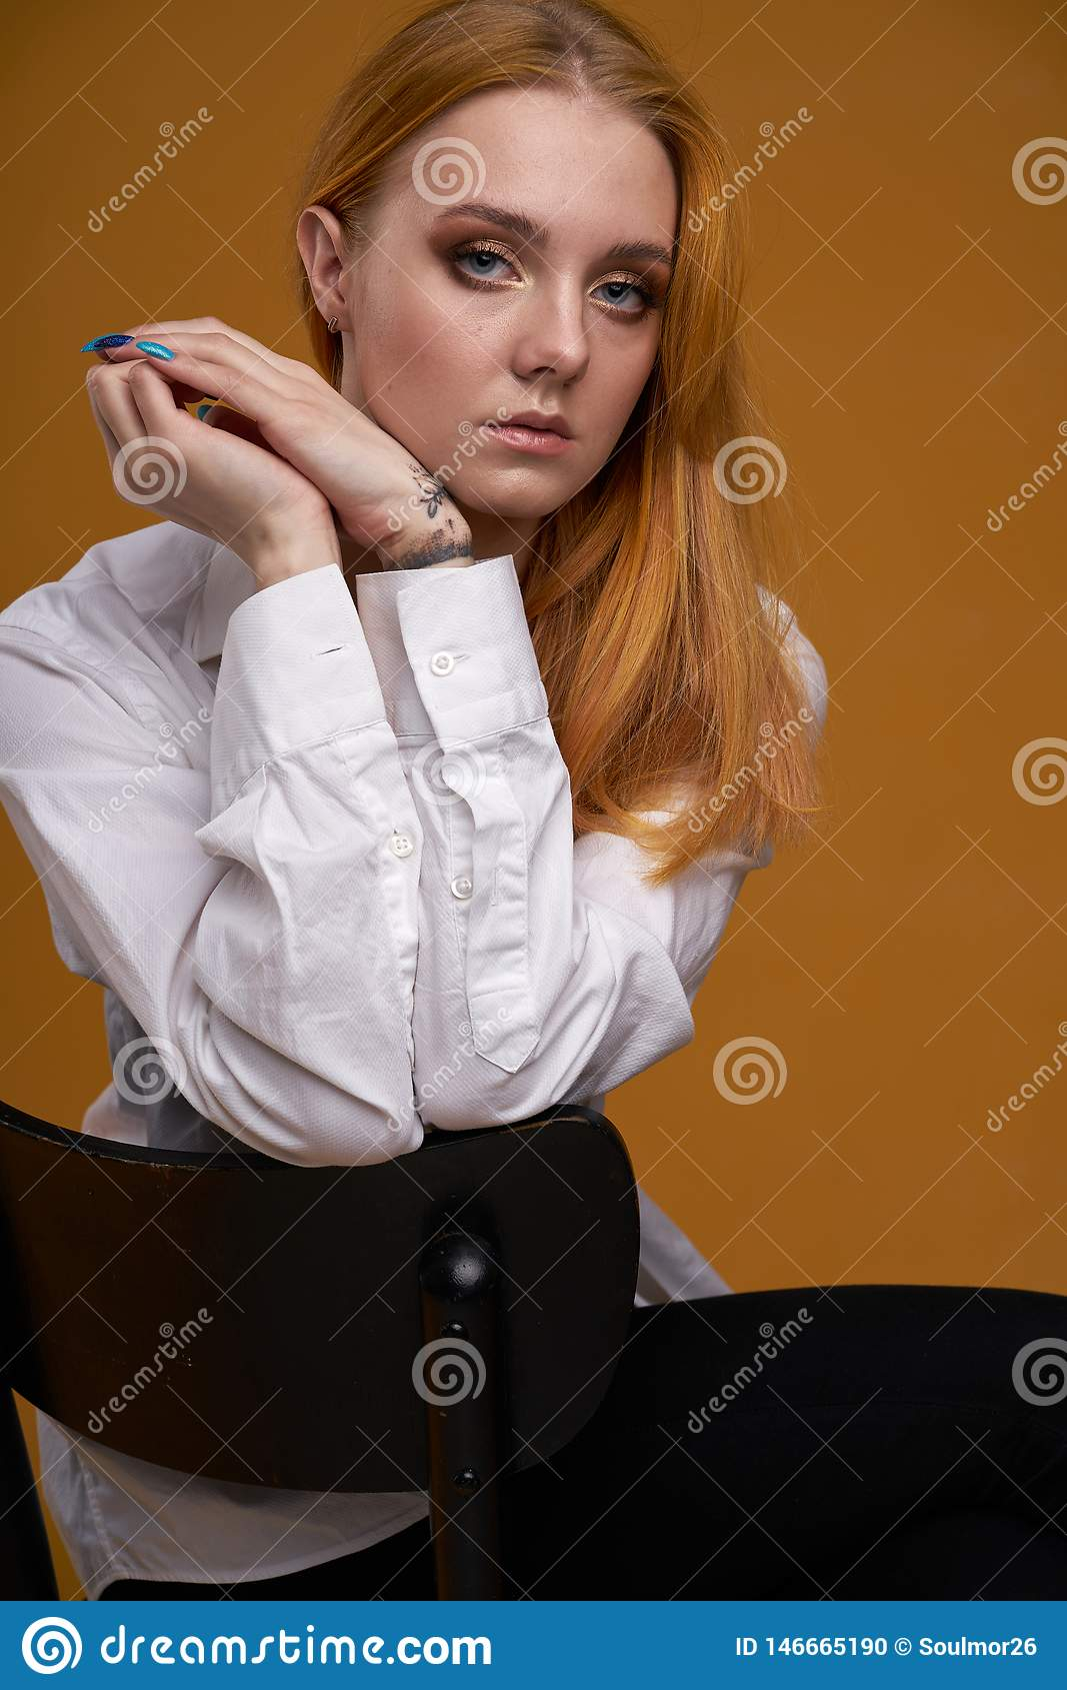 Mo?a ? moda com o cabelo encaracolado, sorrindo cutely, levantando, no fundo amarelo